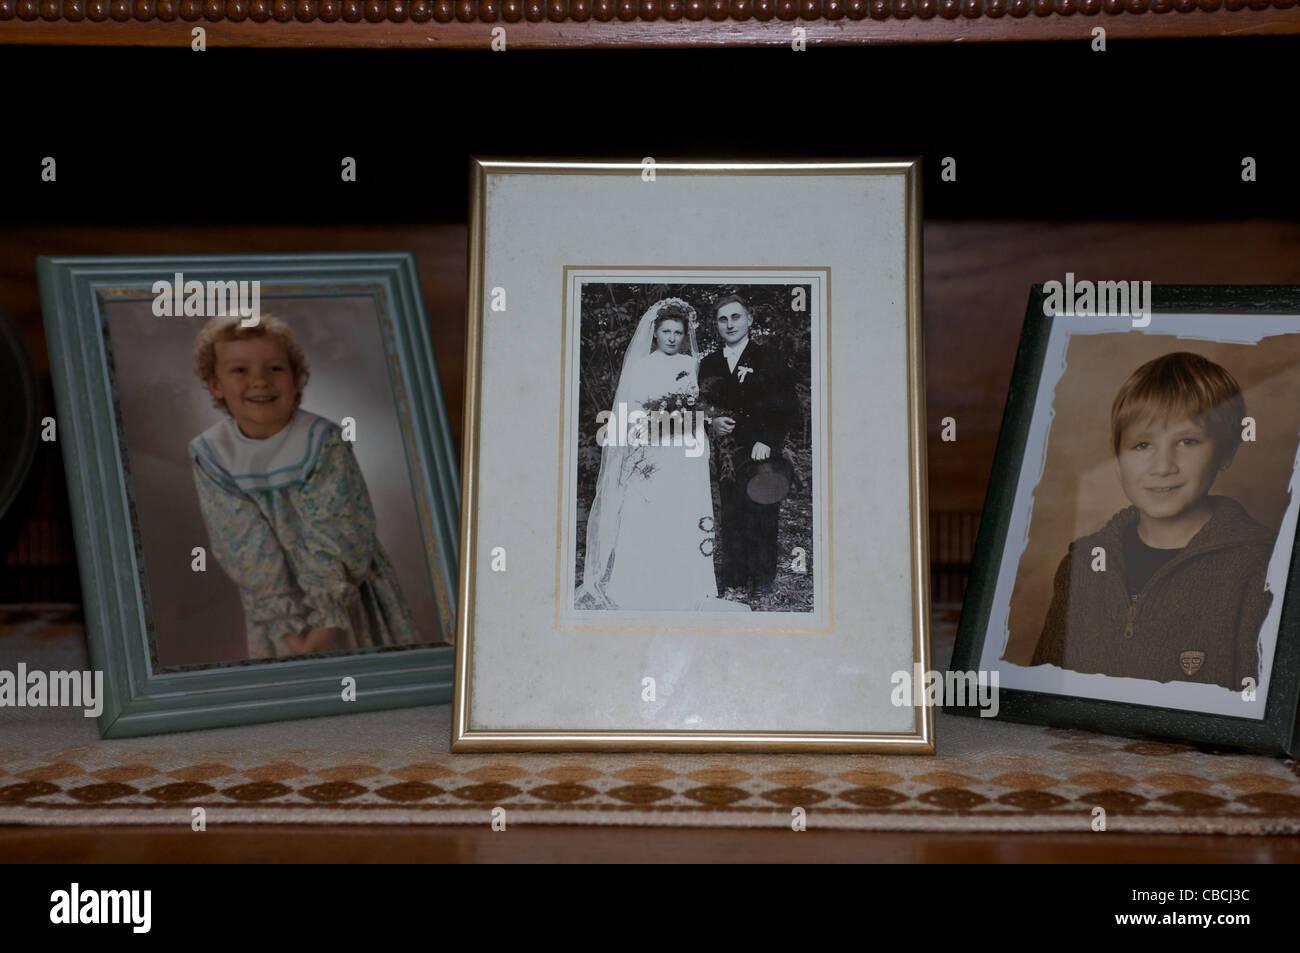 Family portraits - Stock Image